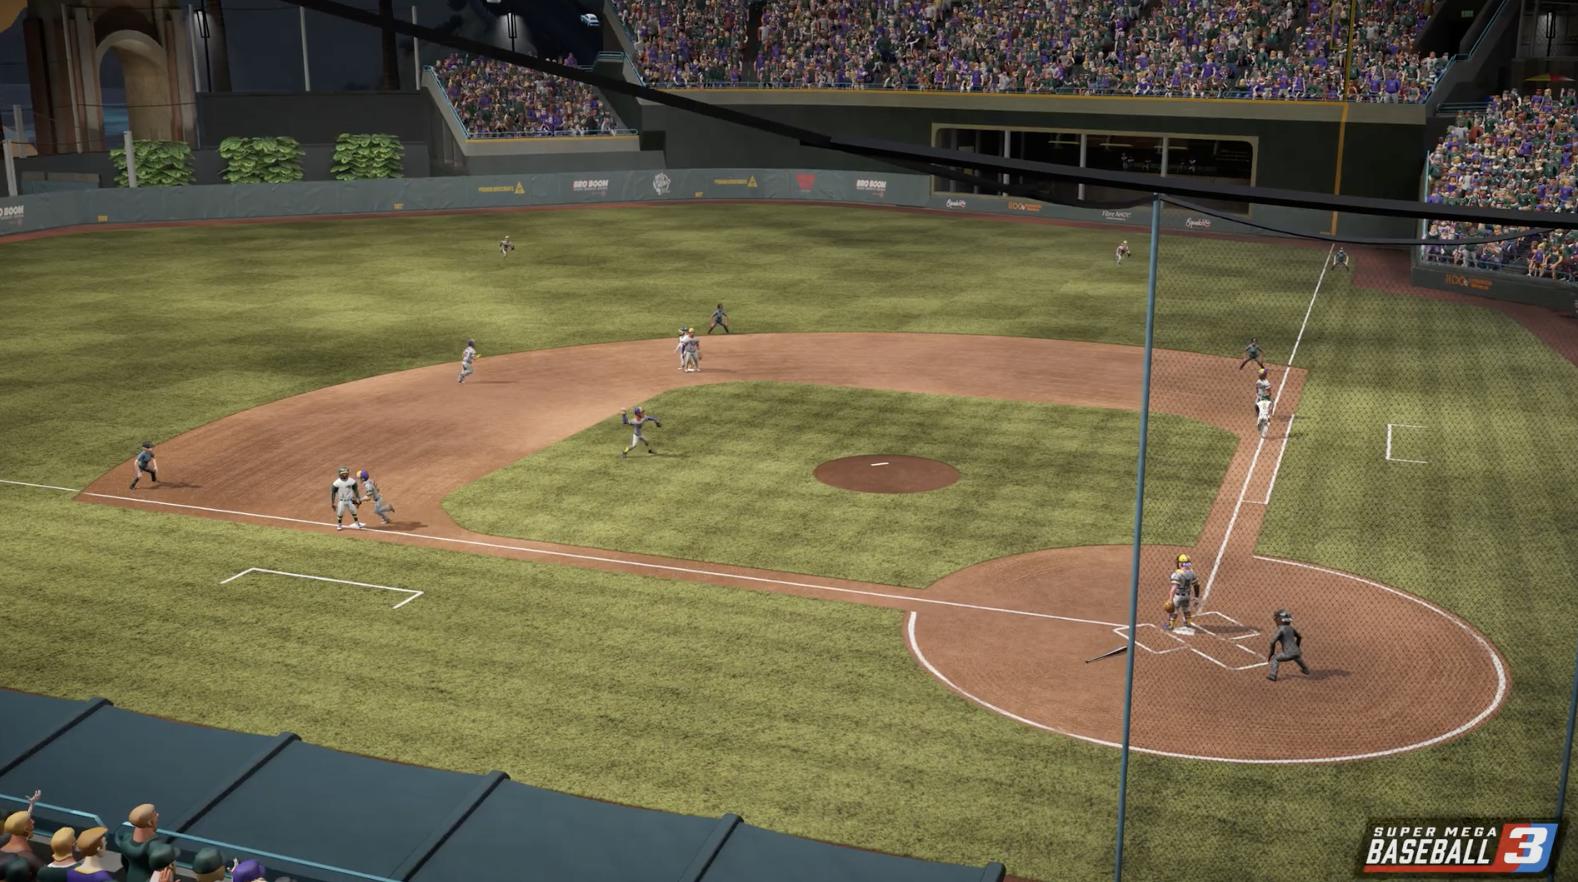 super-mega-baseball-3-p3